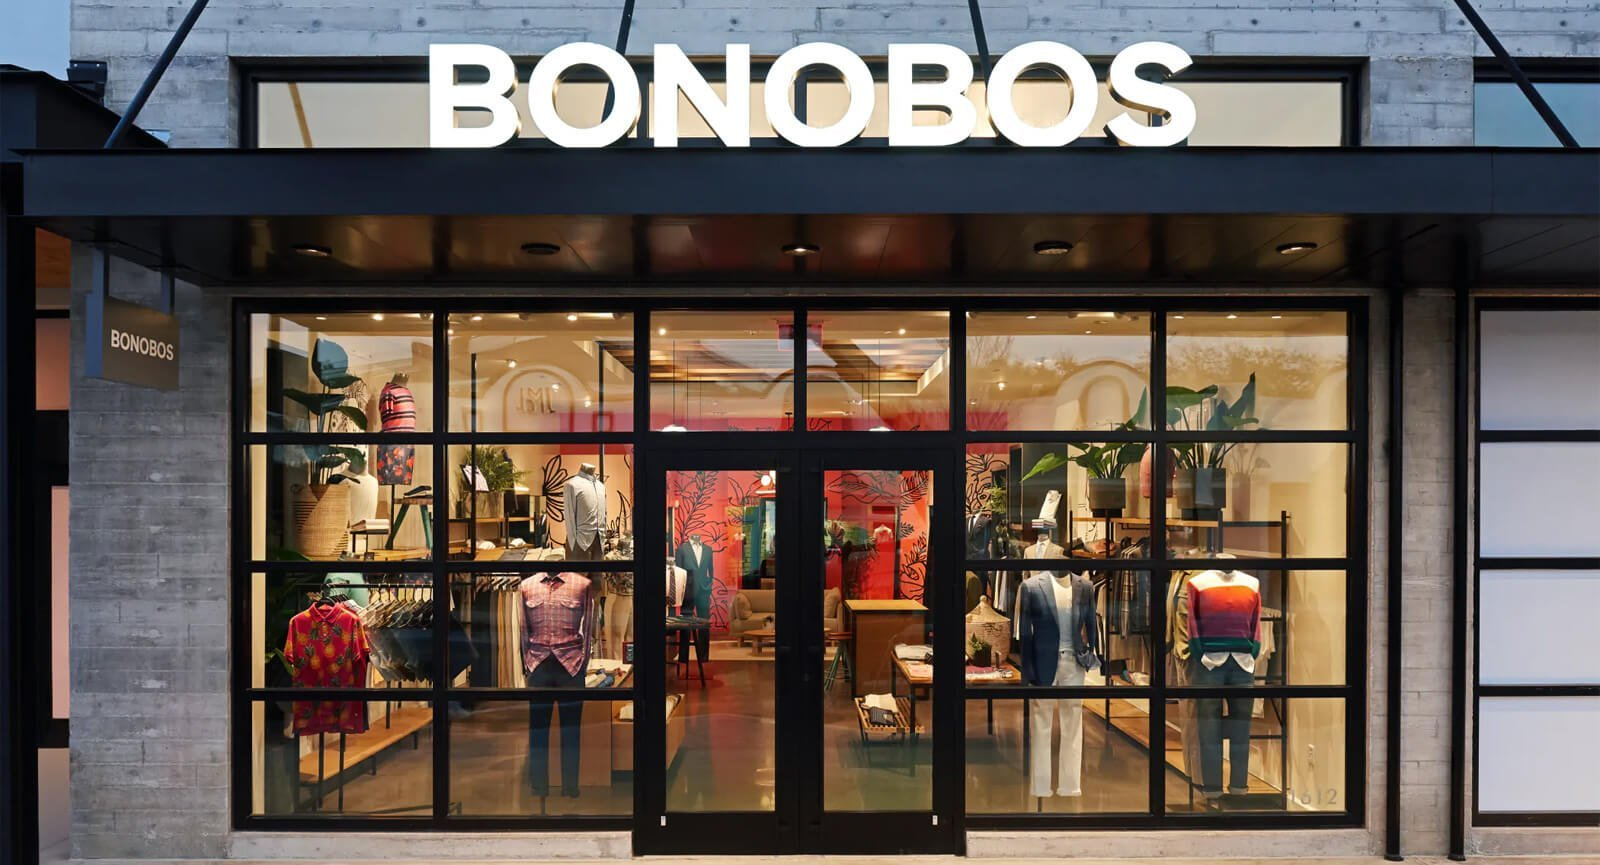 Bonobos Clothing Store Suffers A Data Breach, Hacker Leaks 70GB Database